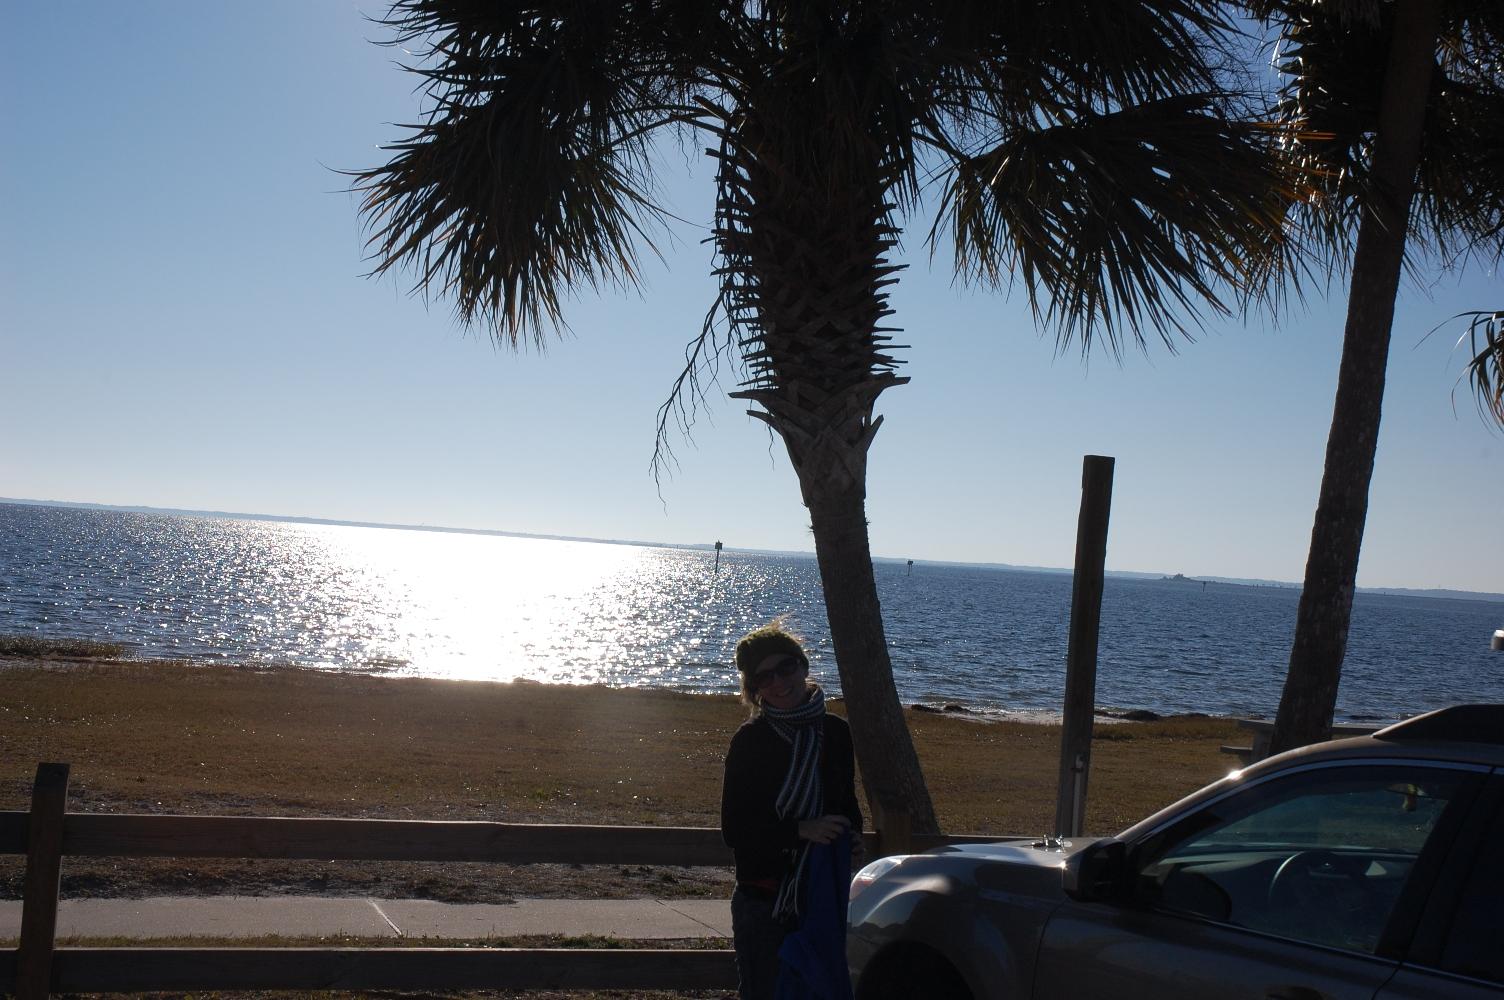 Corey and a palm tree